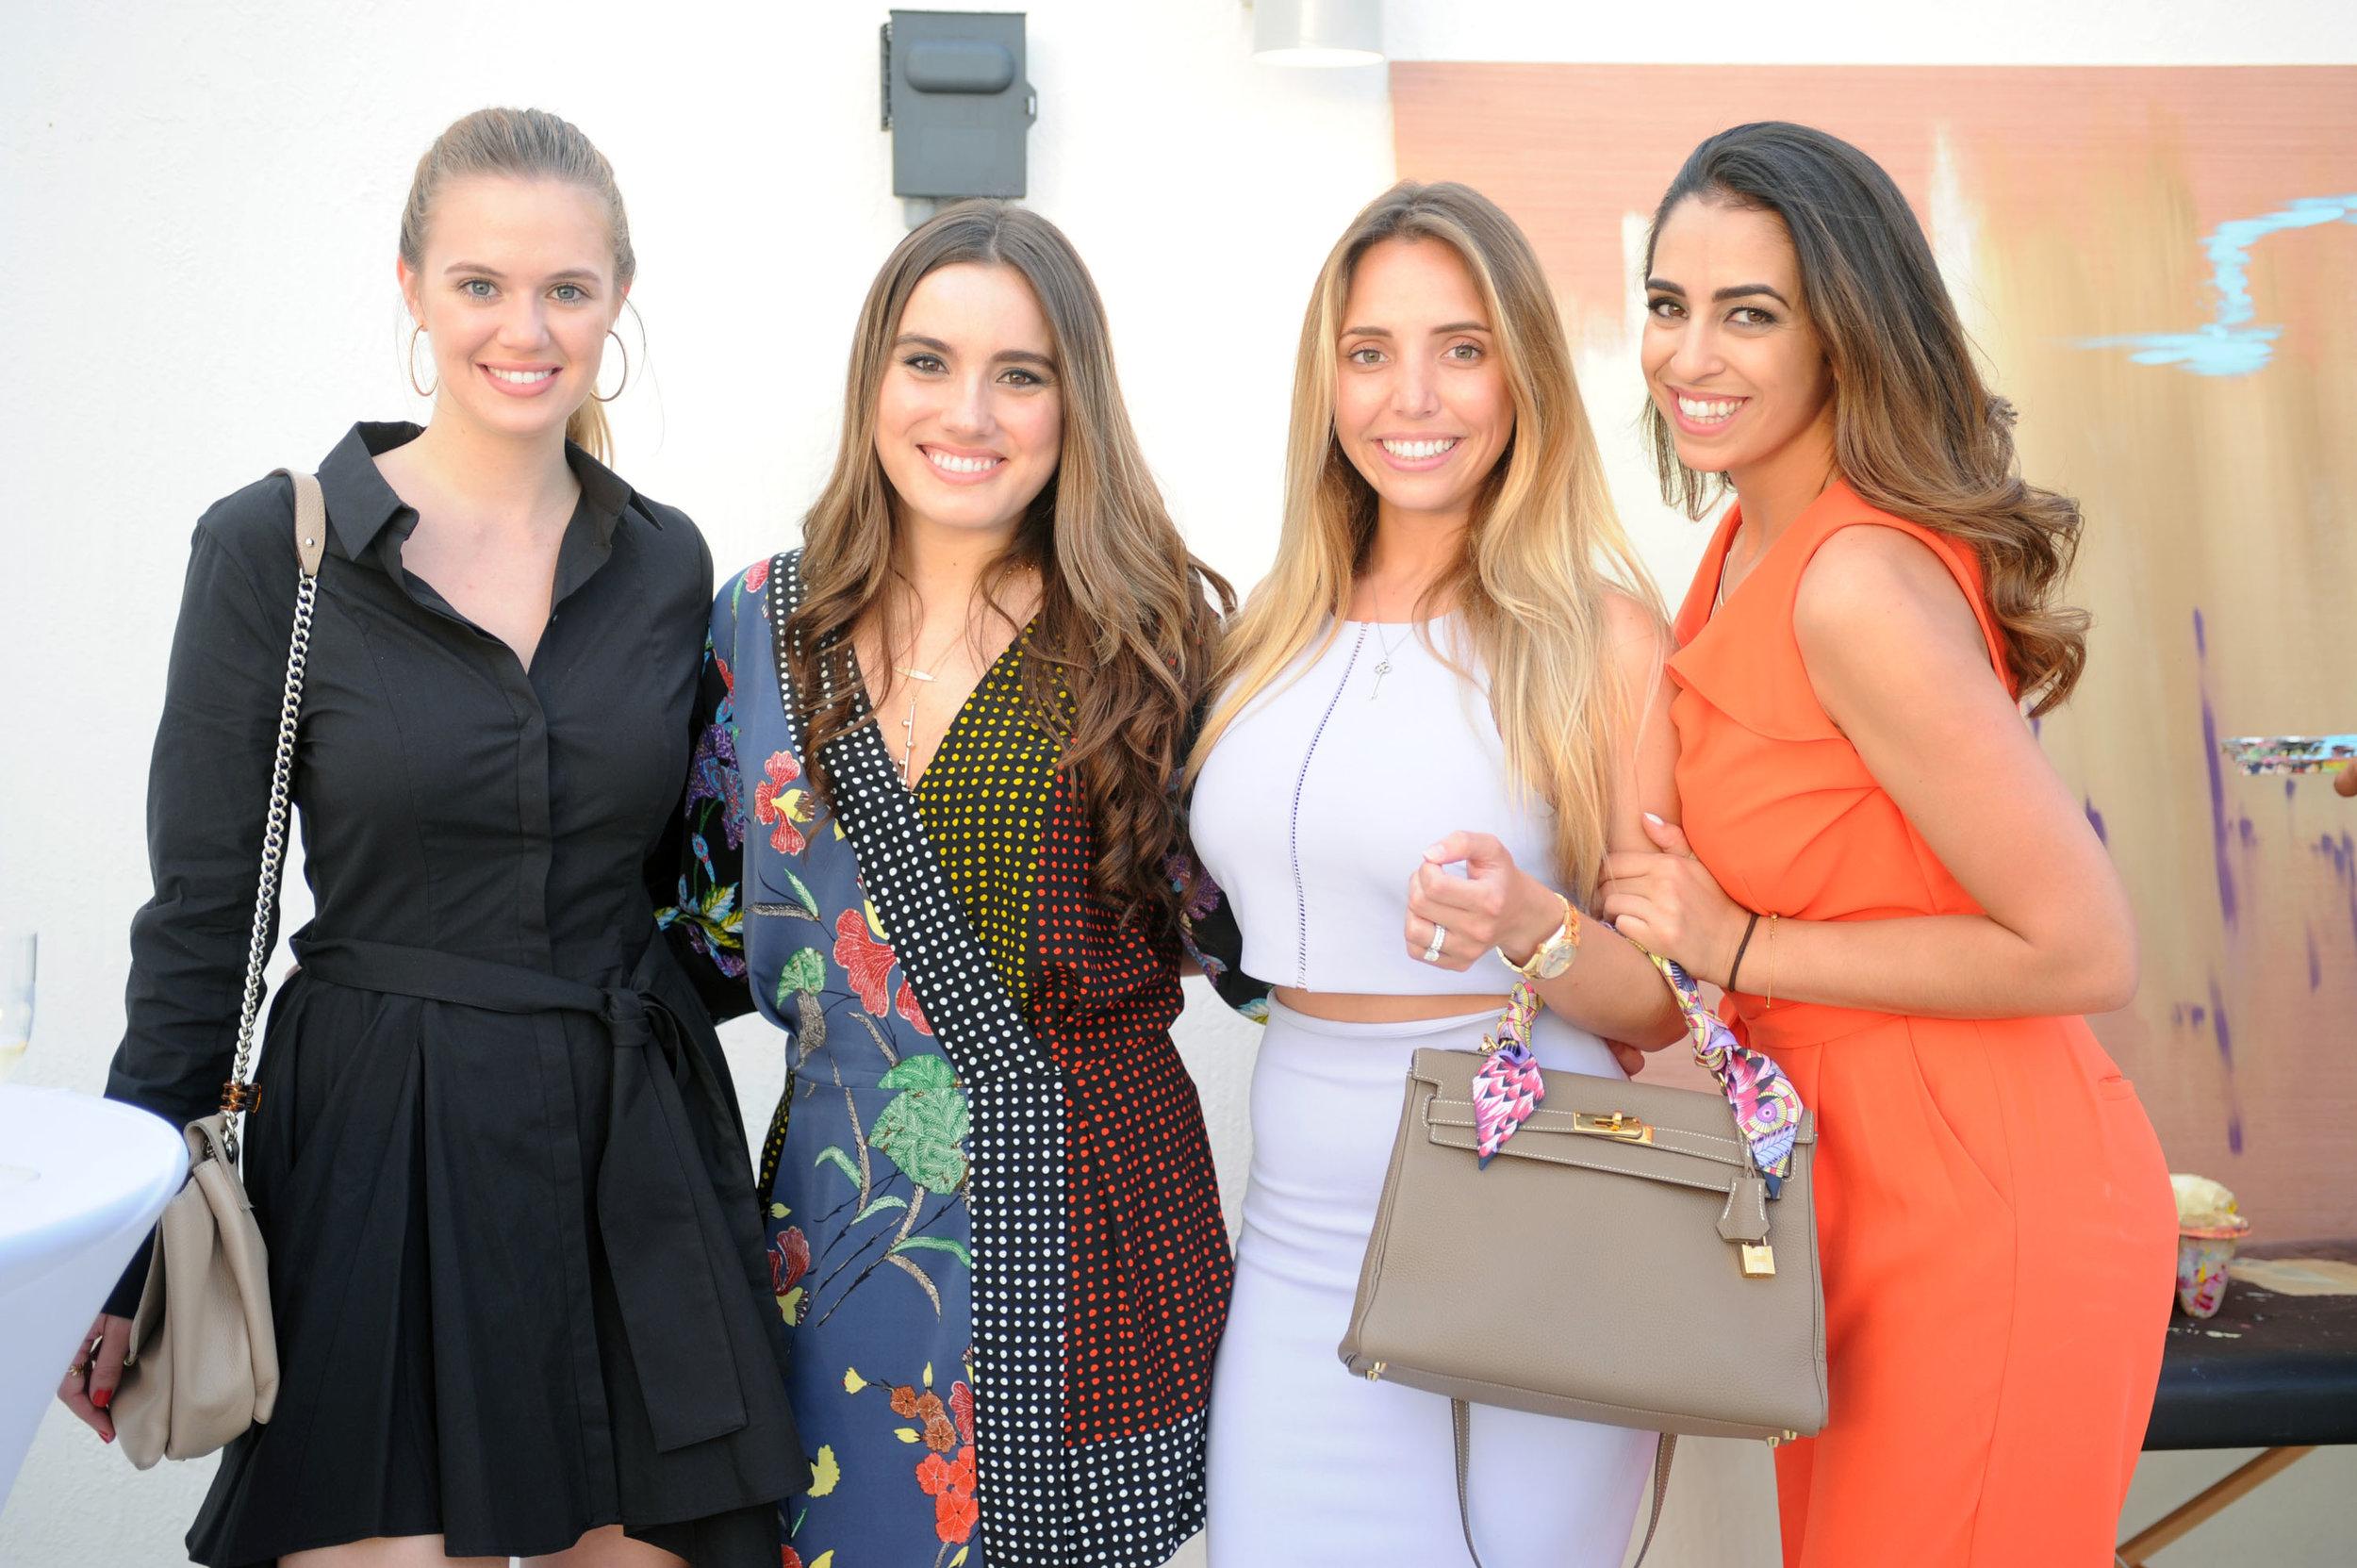 Charina Ferreira, Alexandra Muinos, Crystal Ferreira, & Michelle Setty.jpg